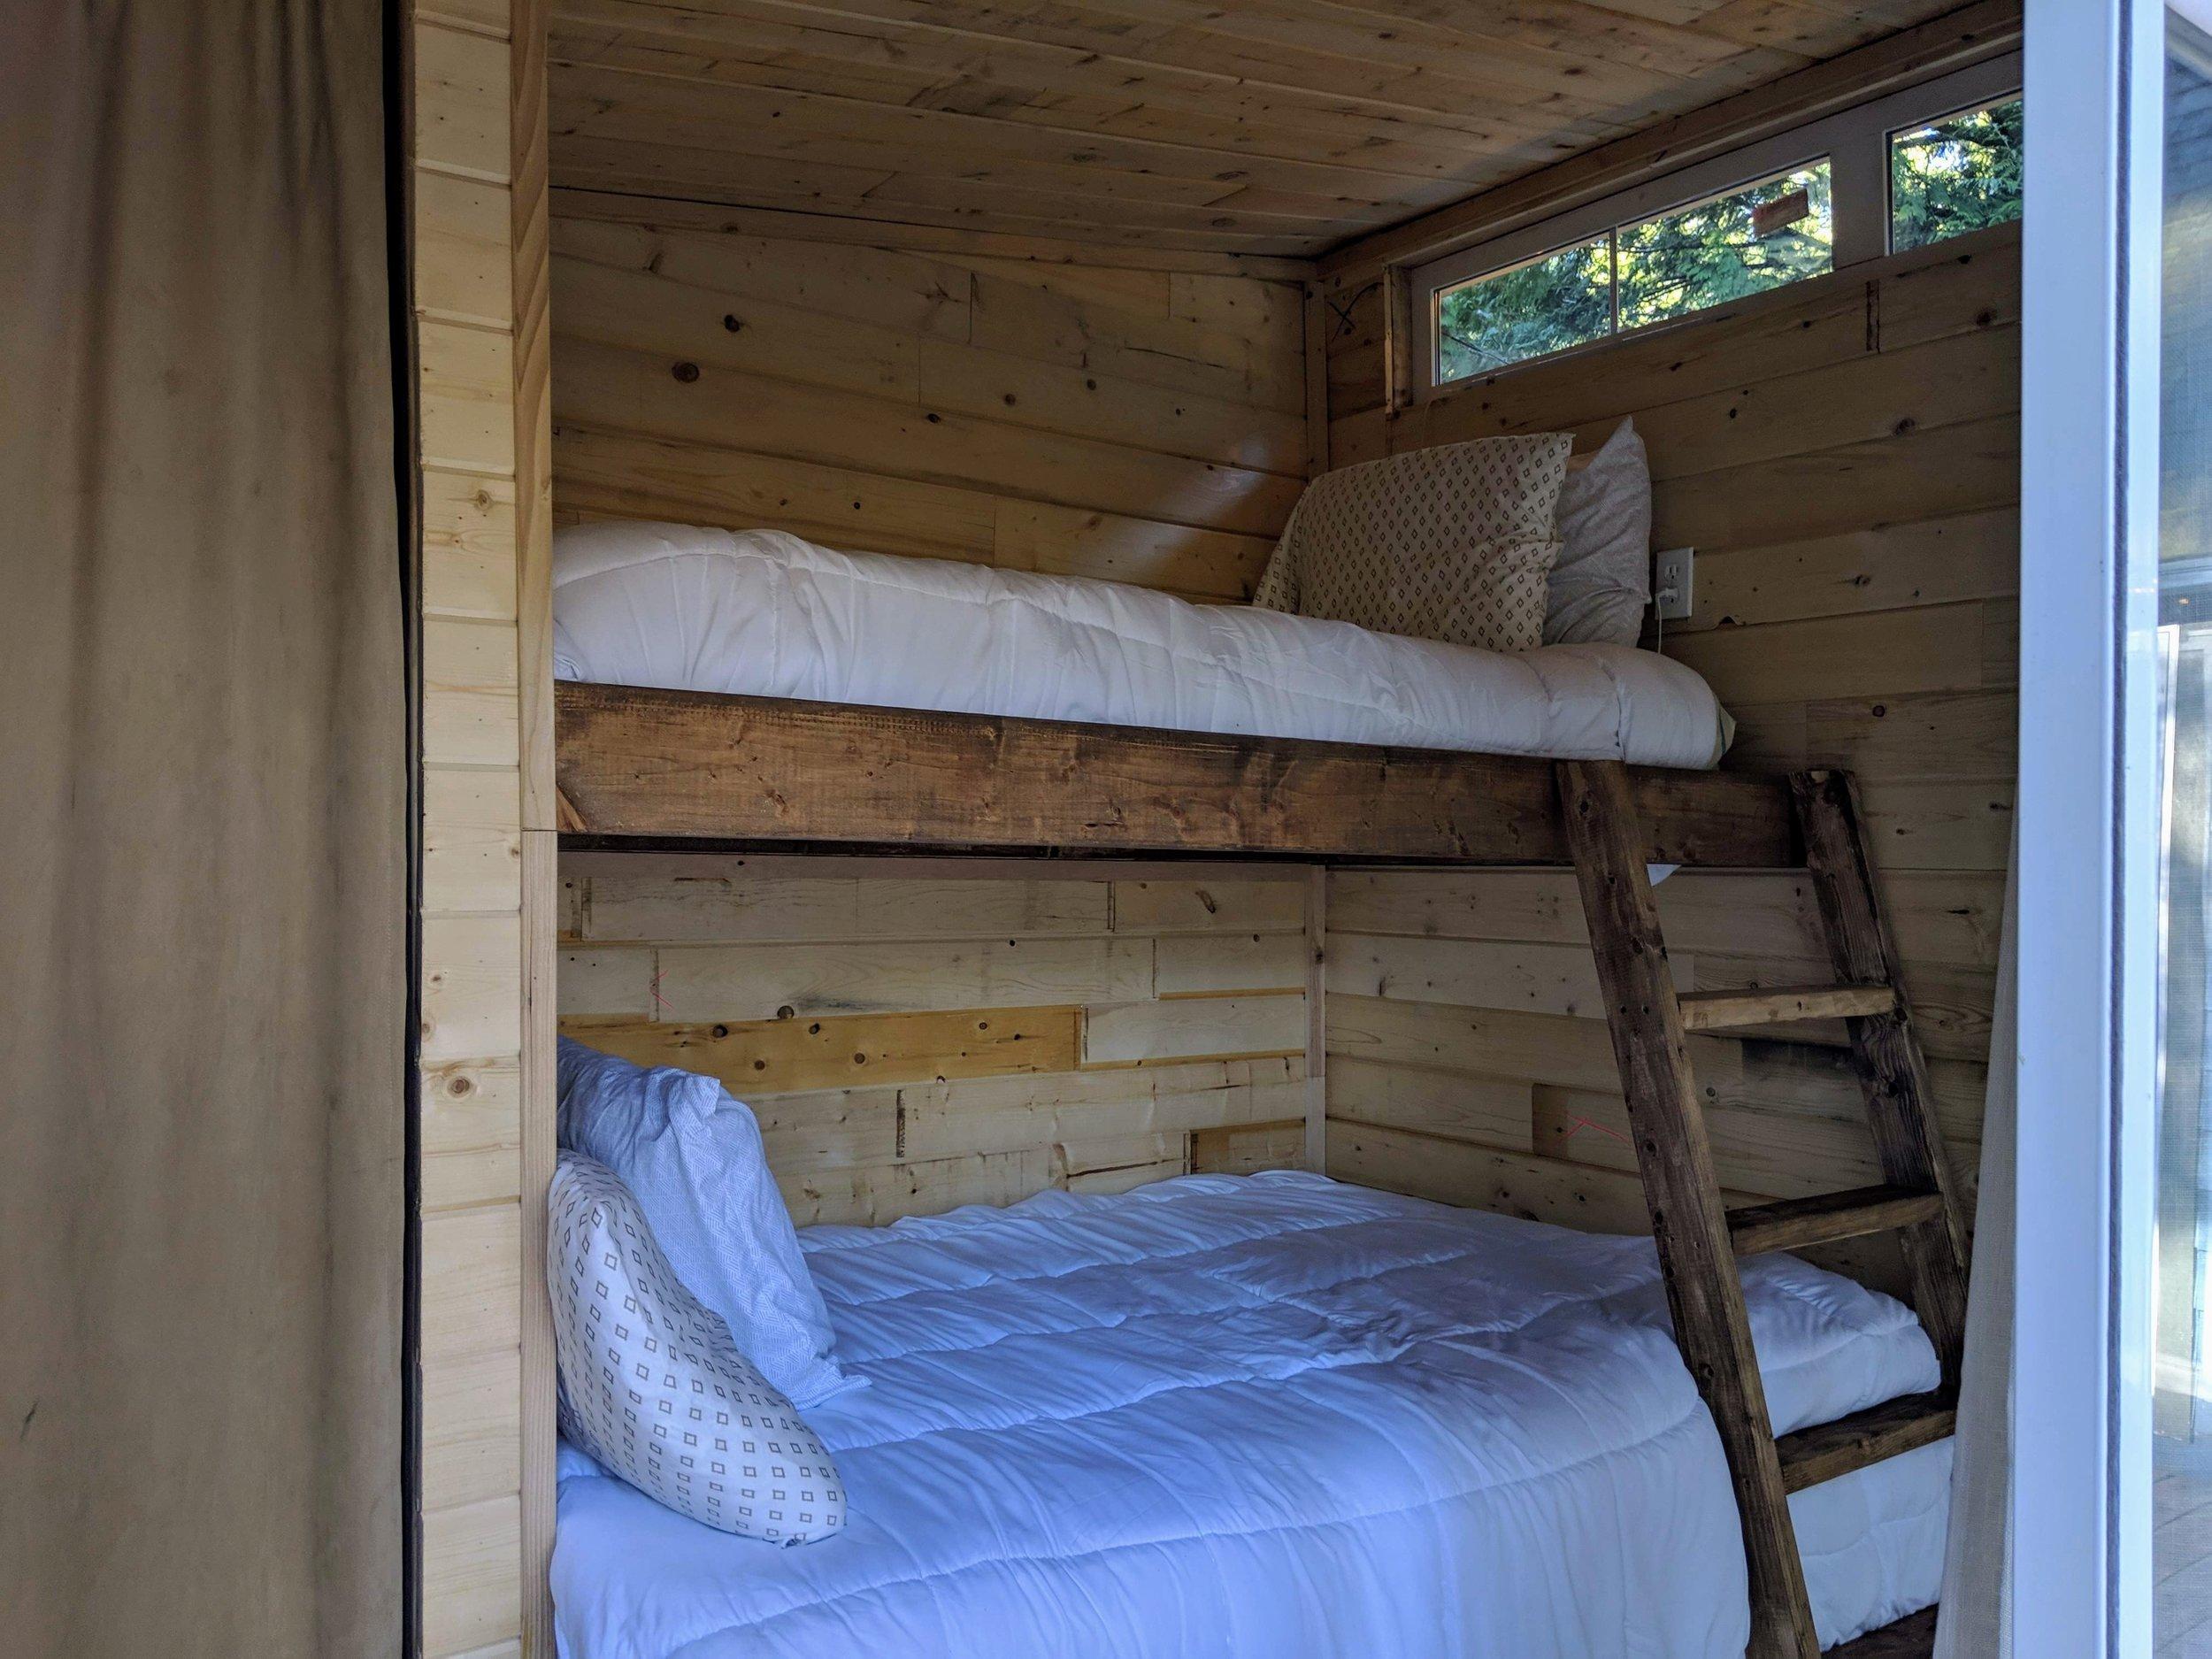 Bunkhouse bunkbeds